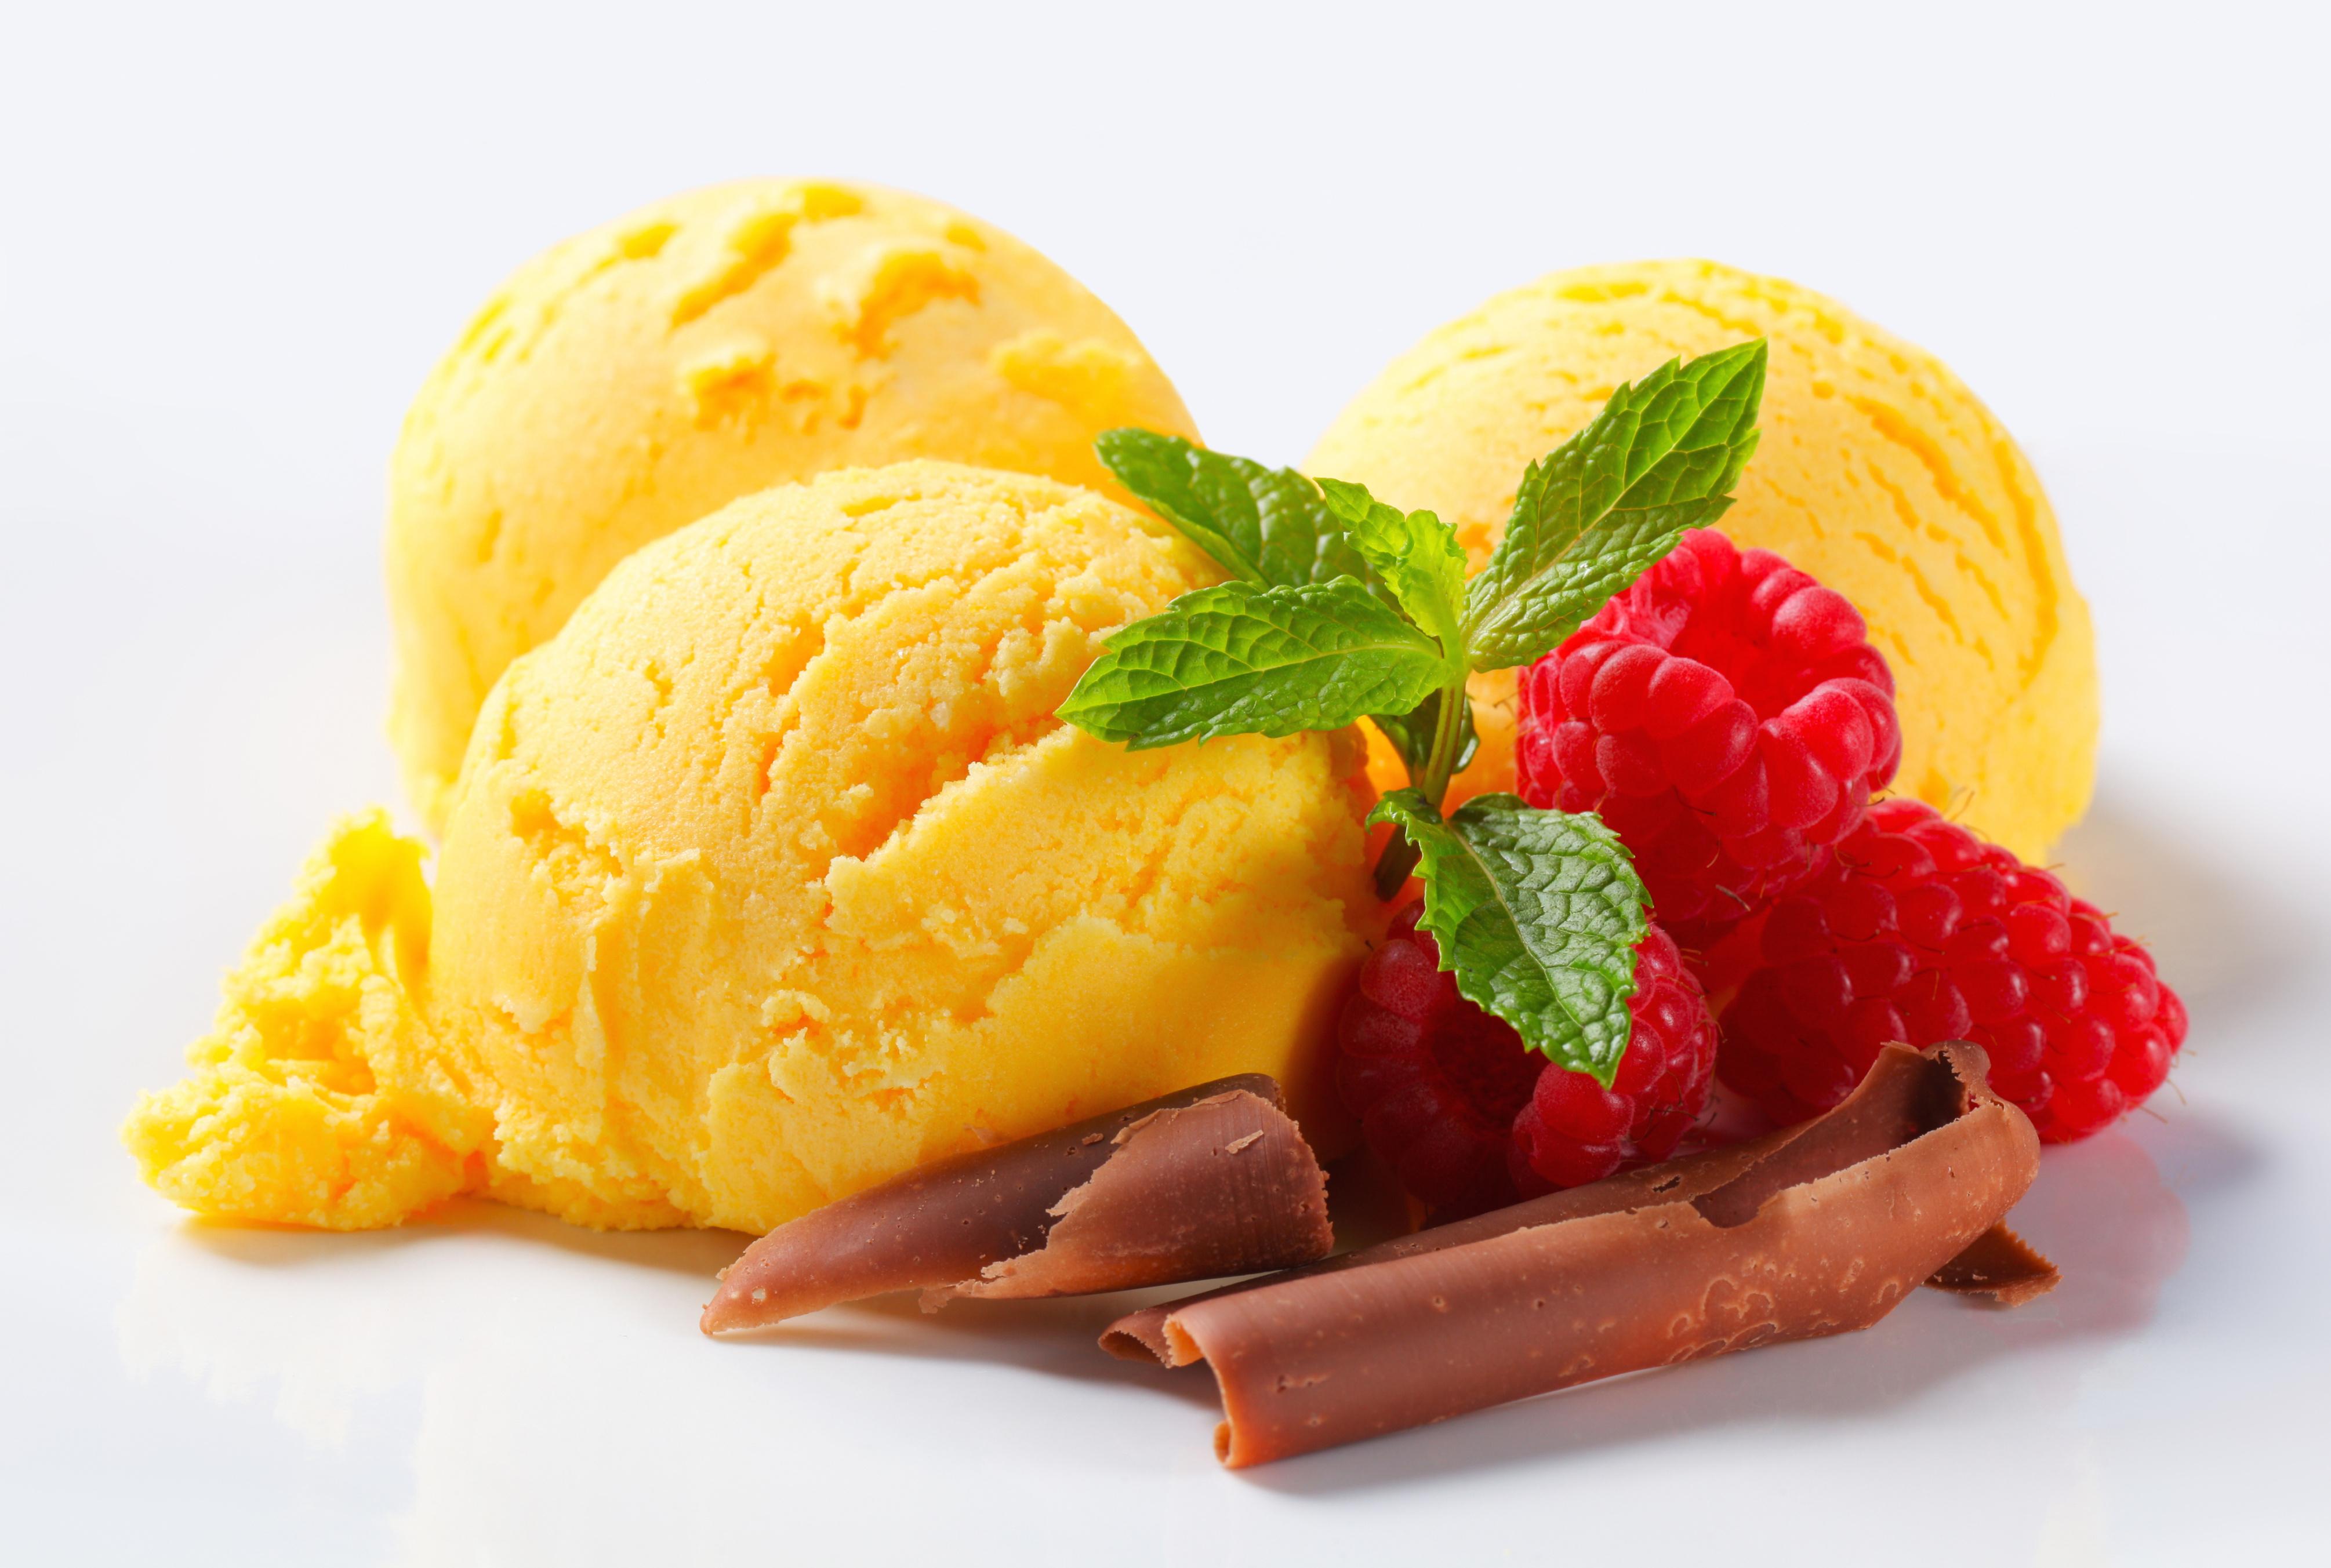 Ice Cream 4k Ultra HD Wallpaper | Background Image ...